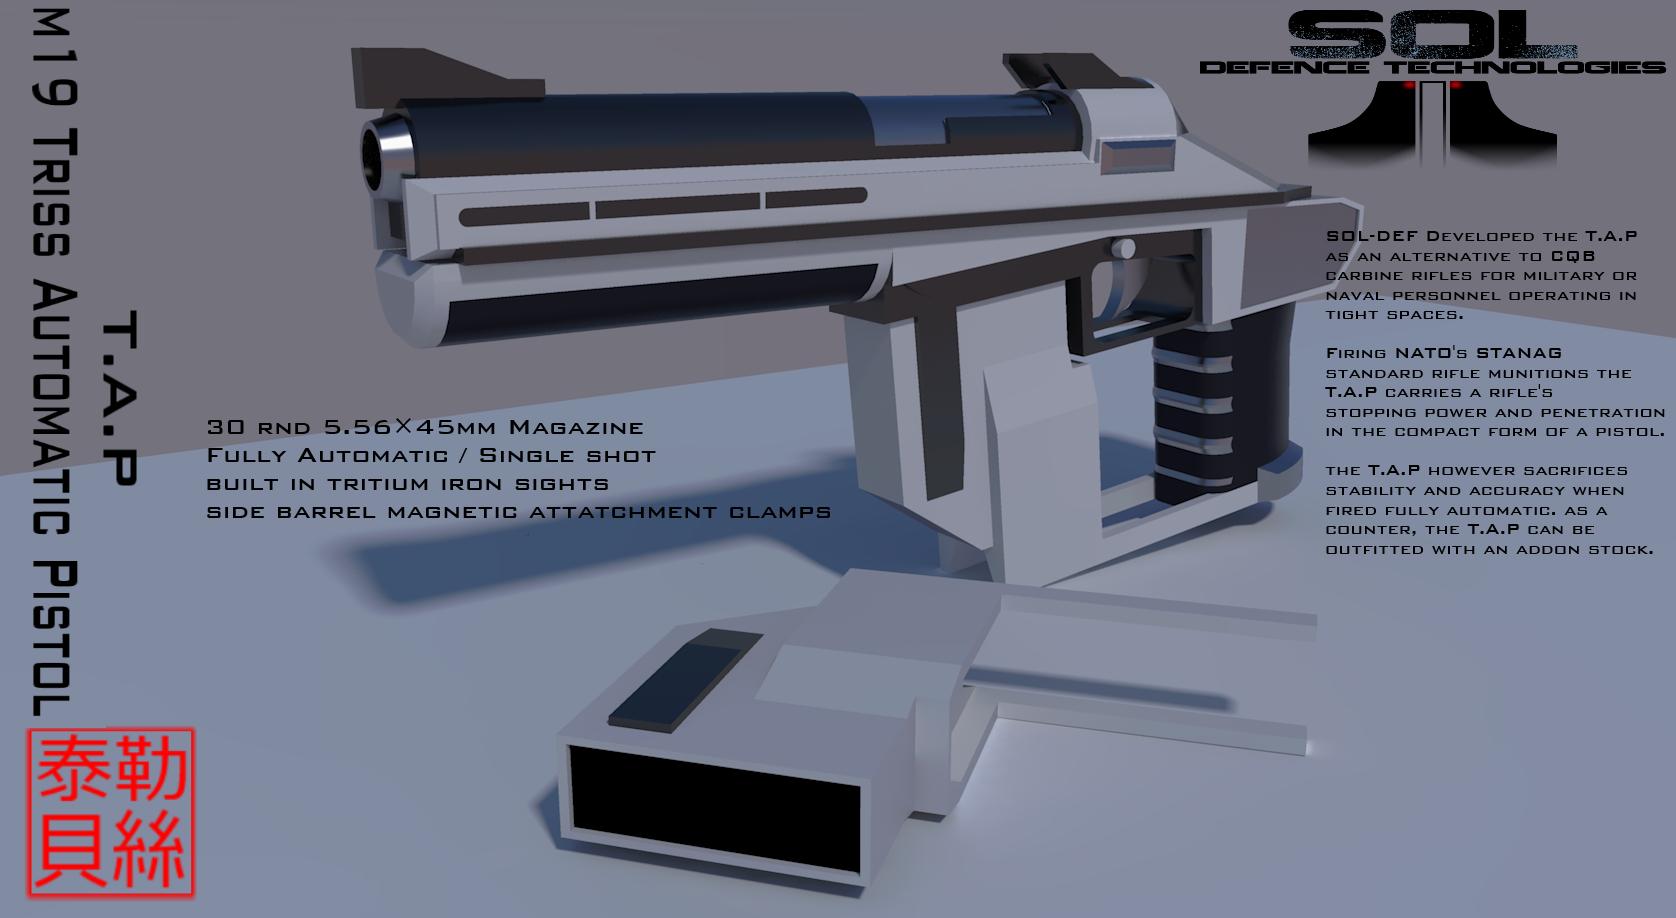 M19 Triss Automatic Pistol by Gwentari